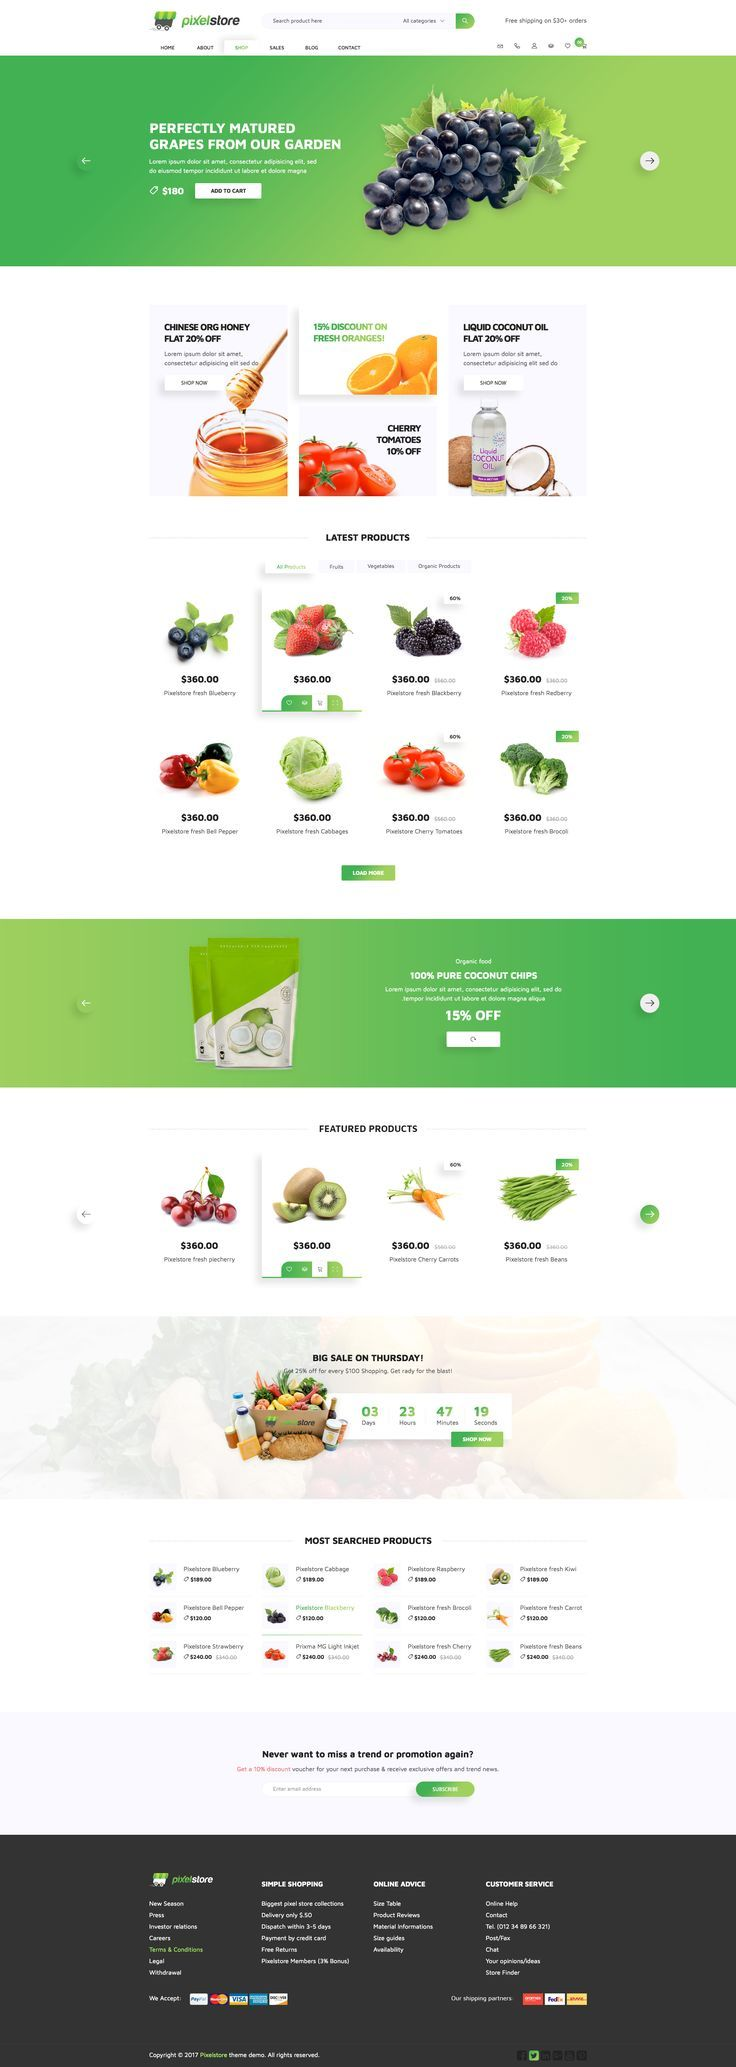 51 best ui ux designs images on pinterest psd templates mobile pixelstore ecommerce psd template fandeluxe Choice Image